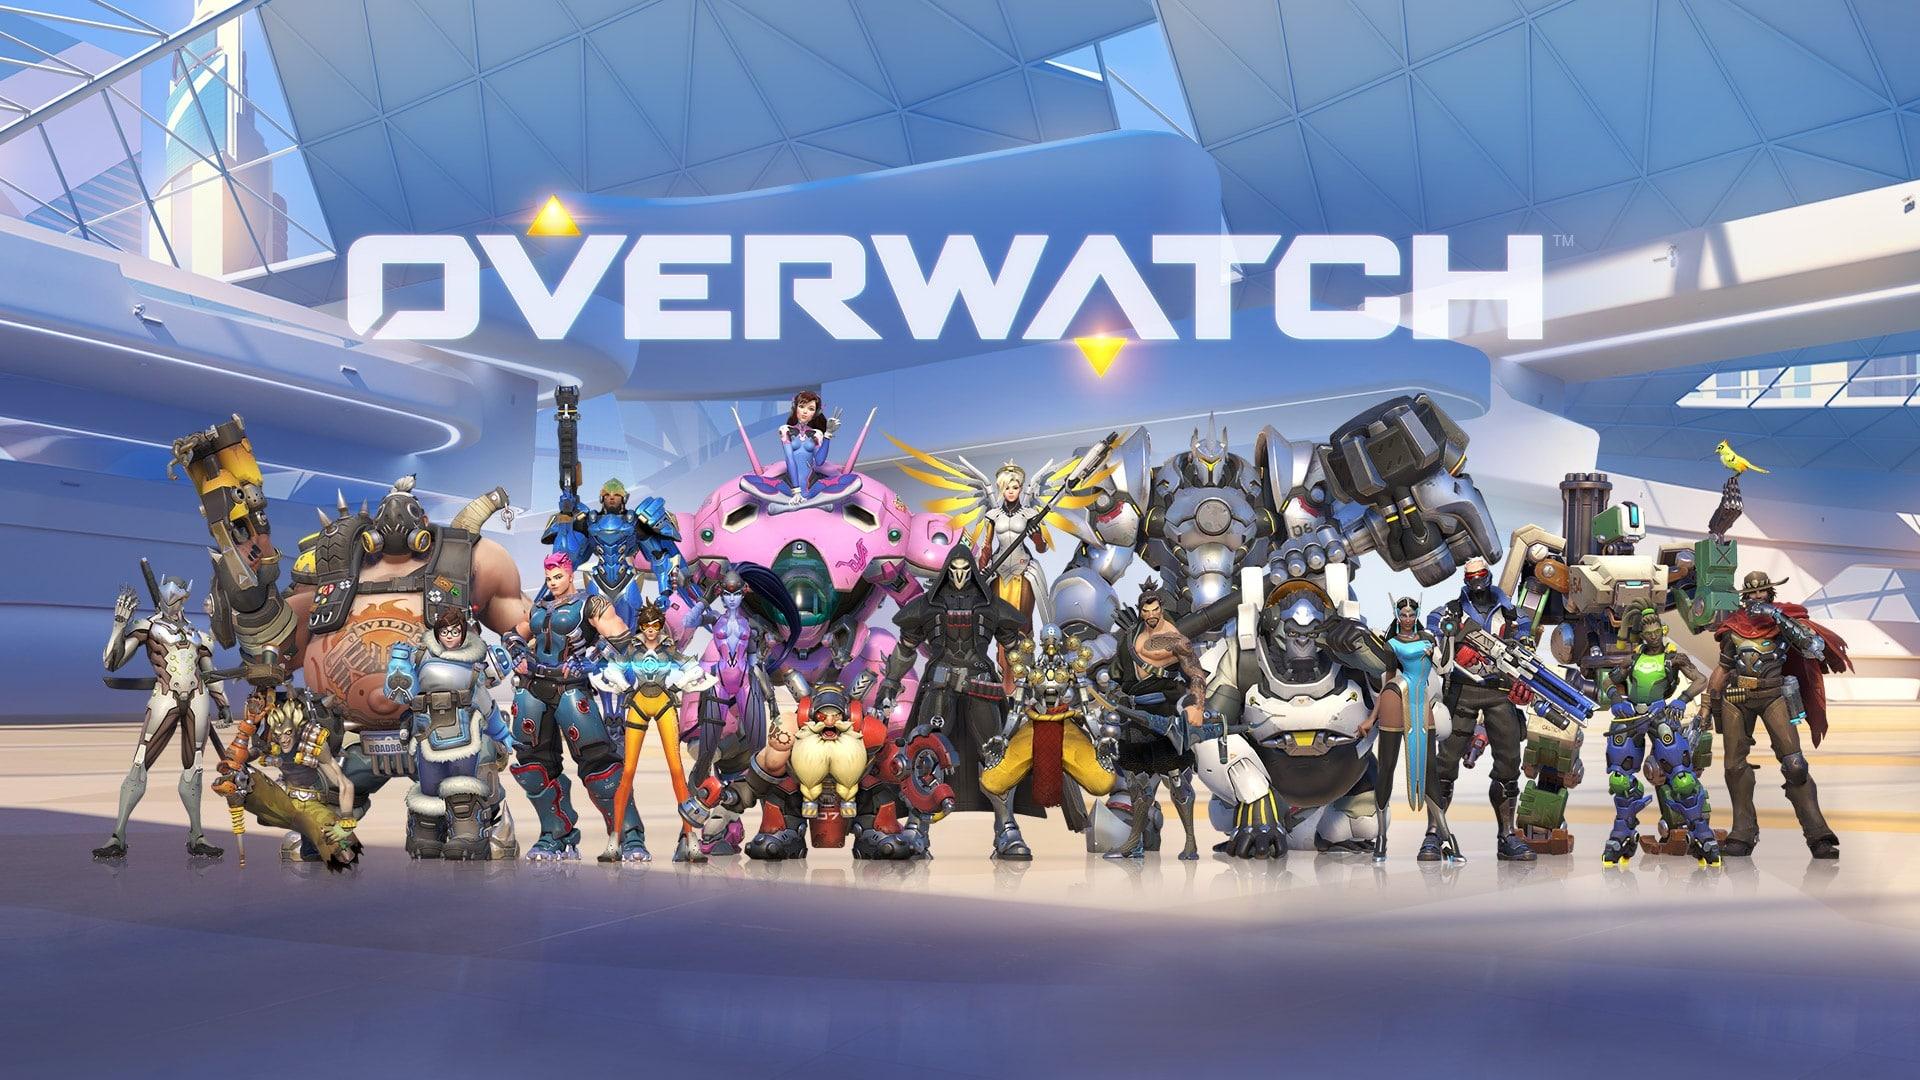 Requisitos Mínimos para Jugar Overwatch